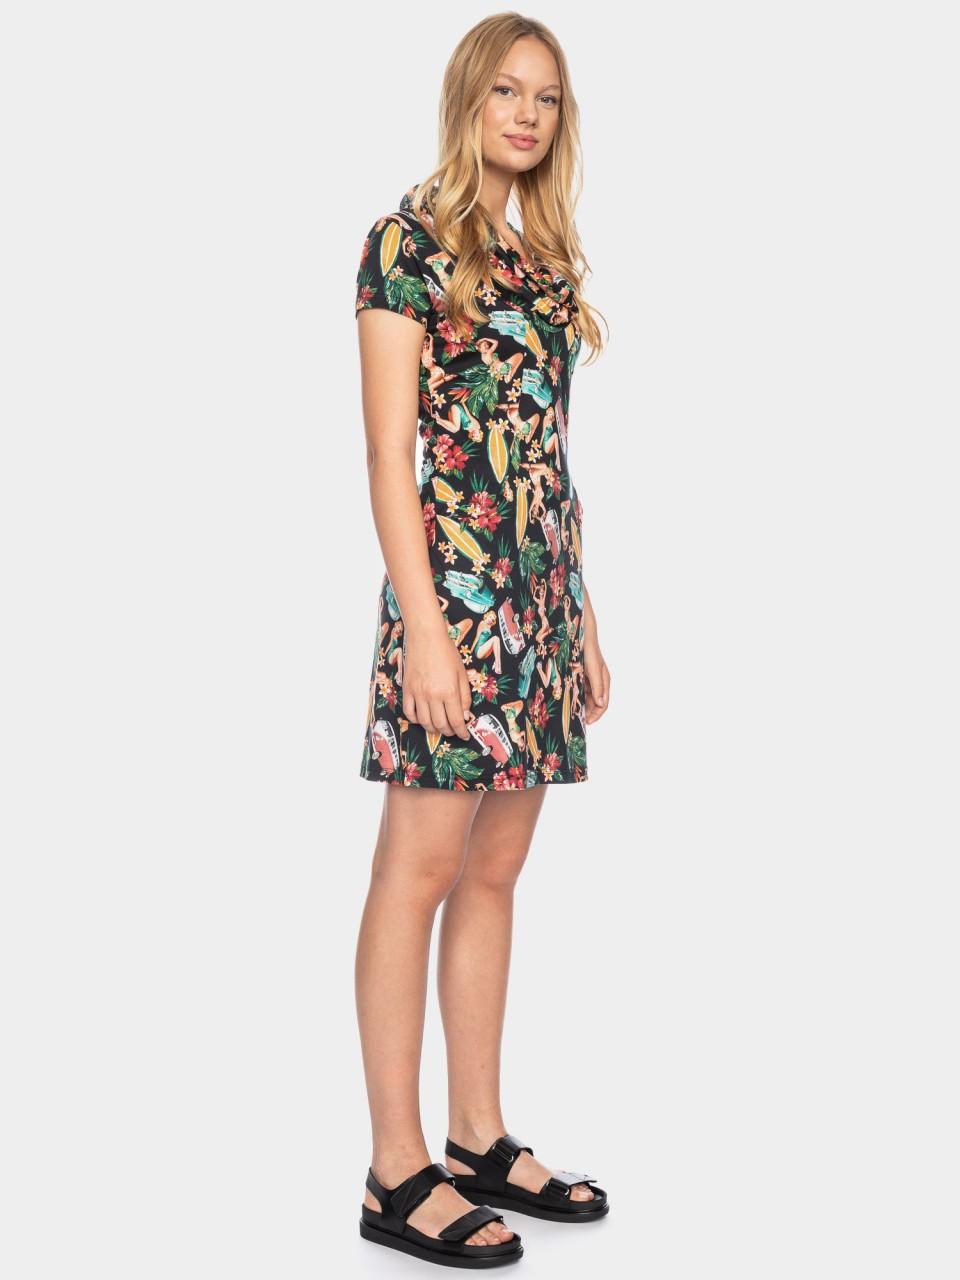 Kleid Erbse CLY/CO 14/043 BLK/MULTI